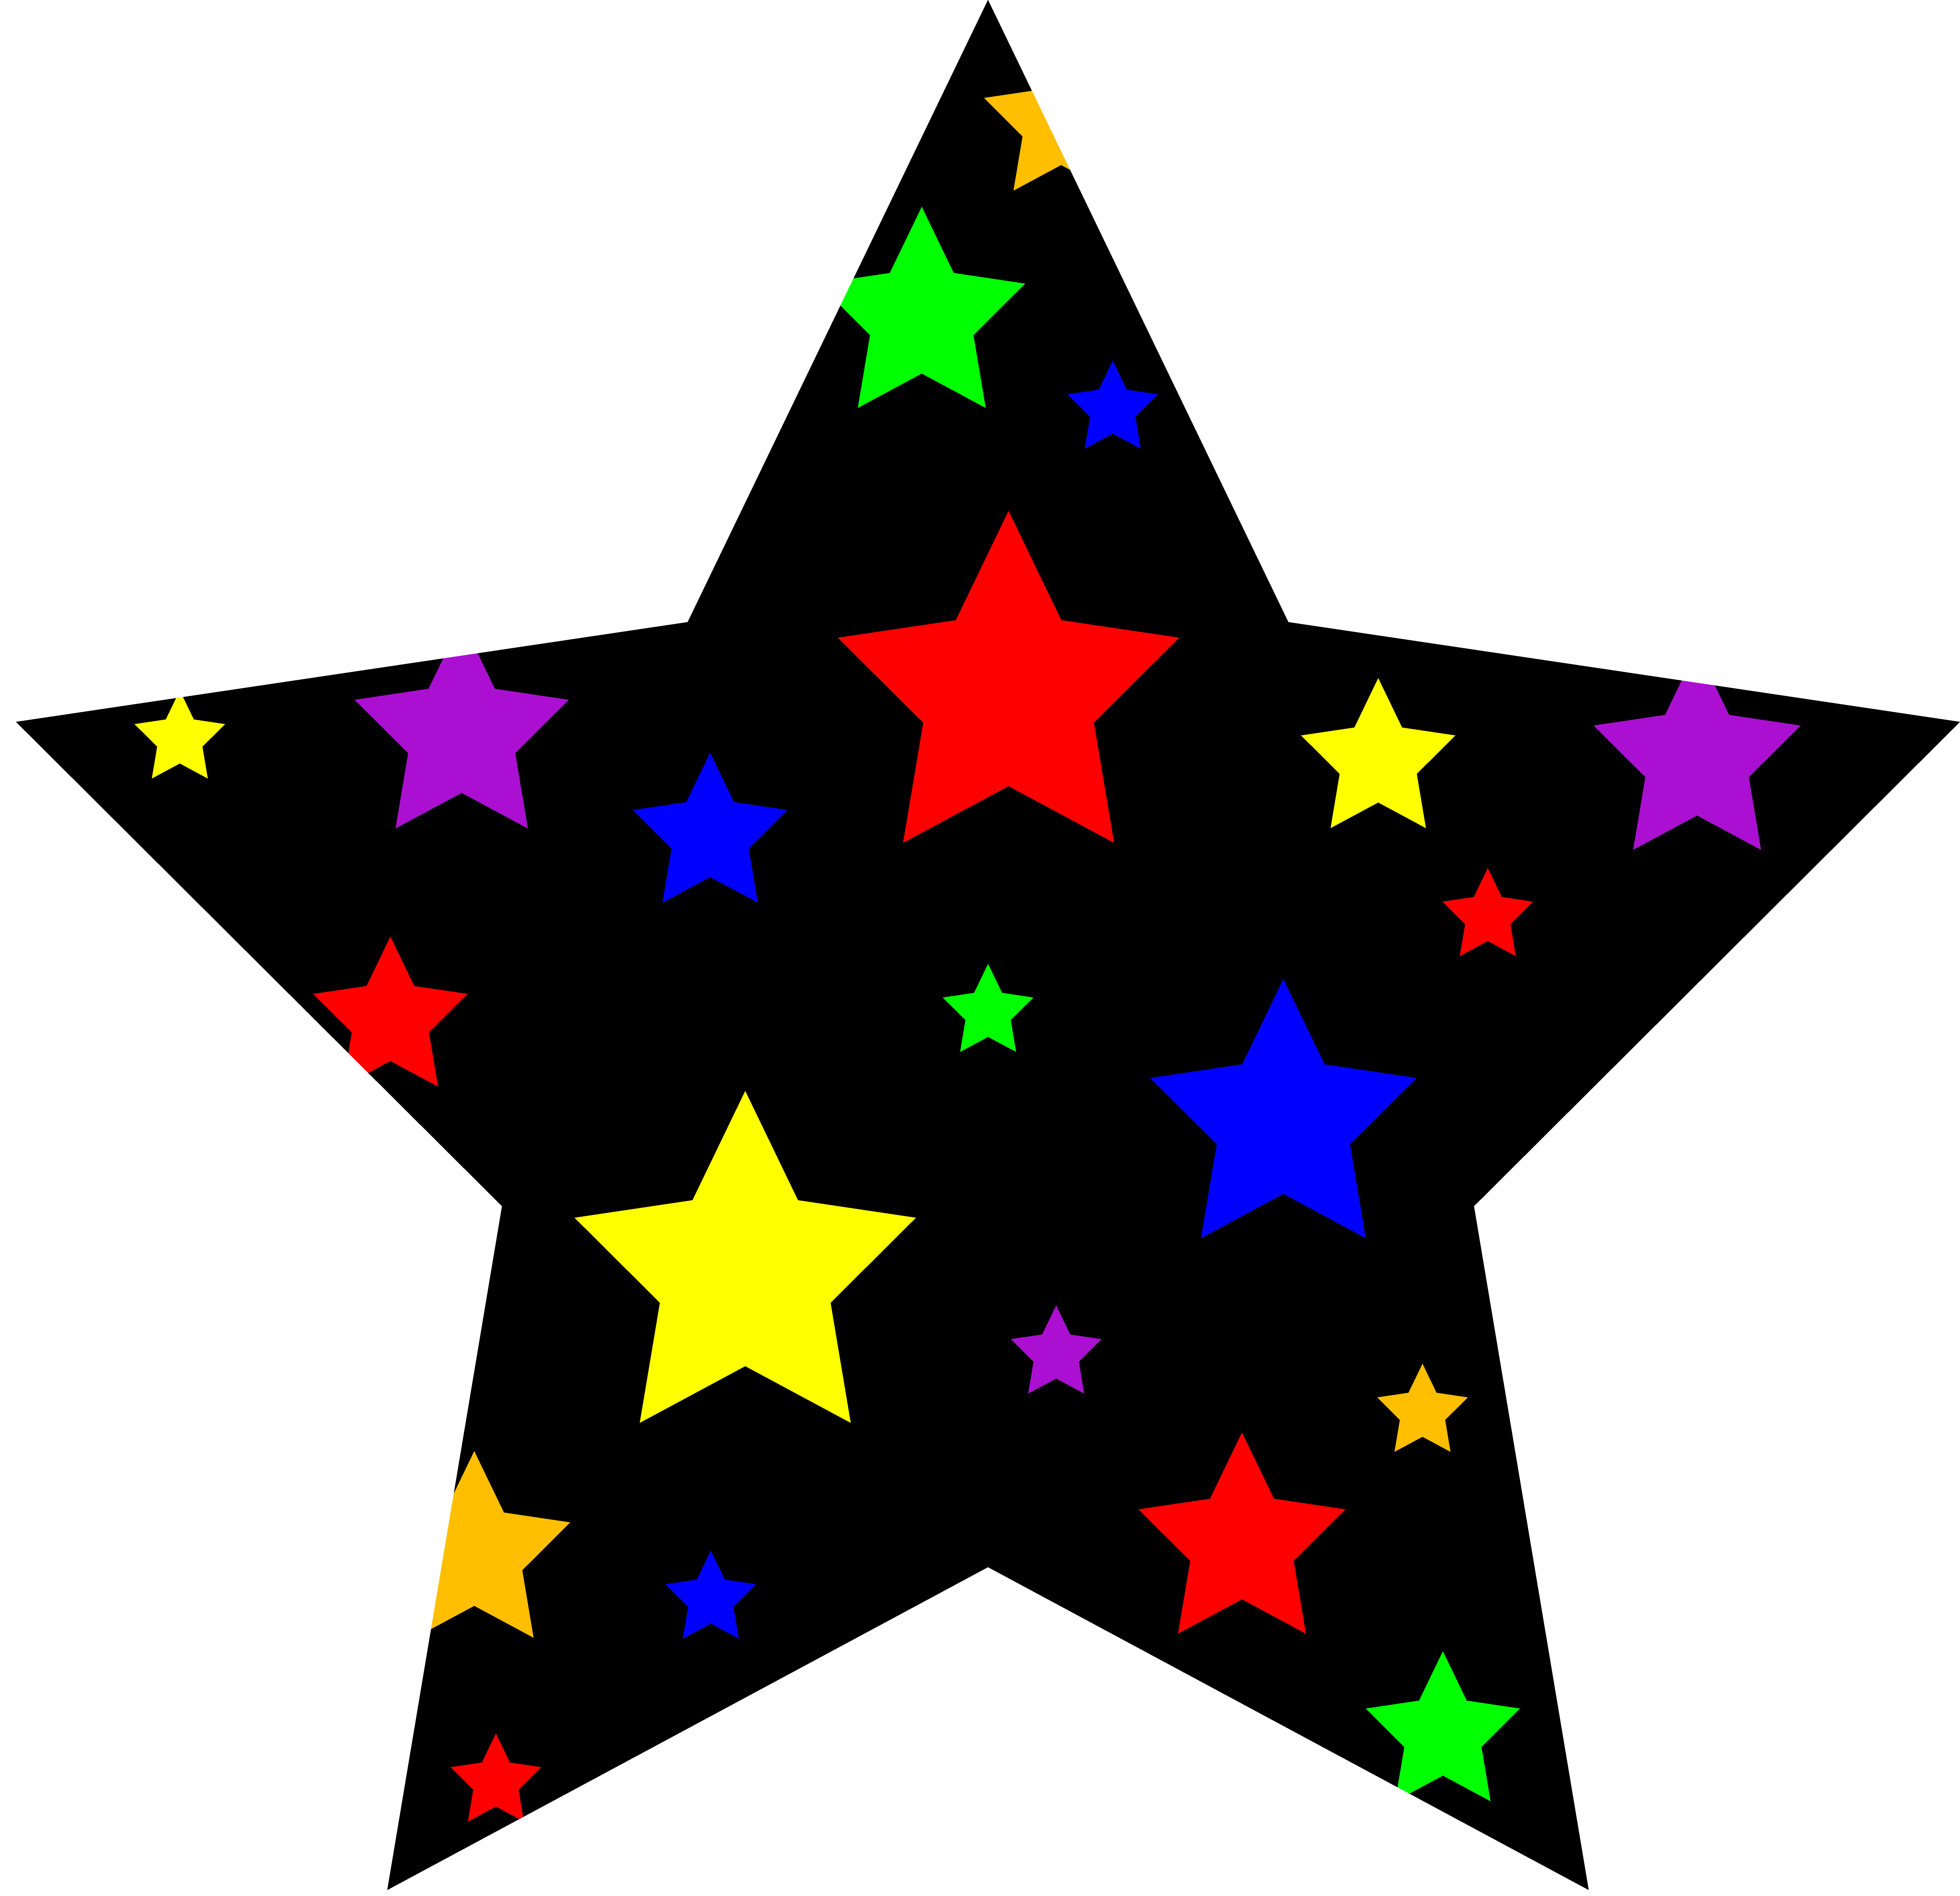 6598x6383 Top Star Clip Art Free Clipart Image